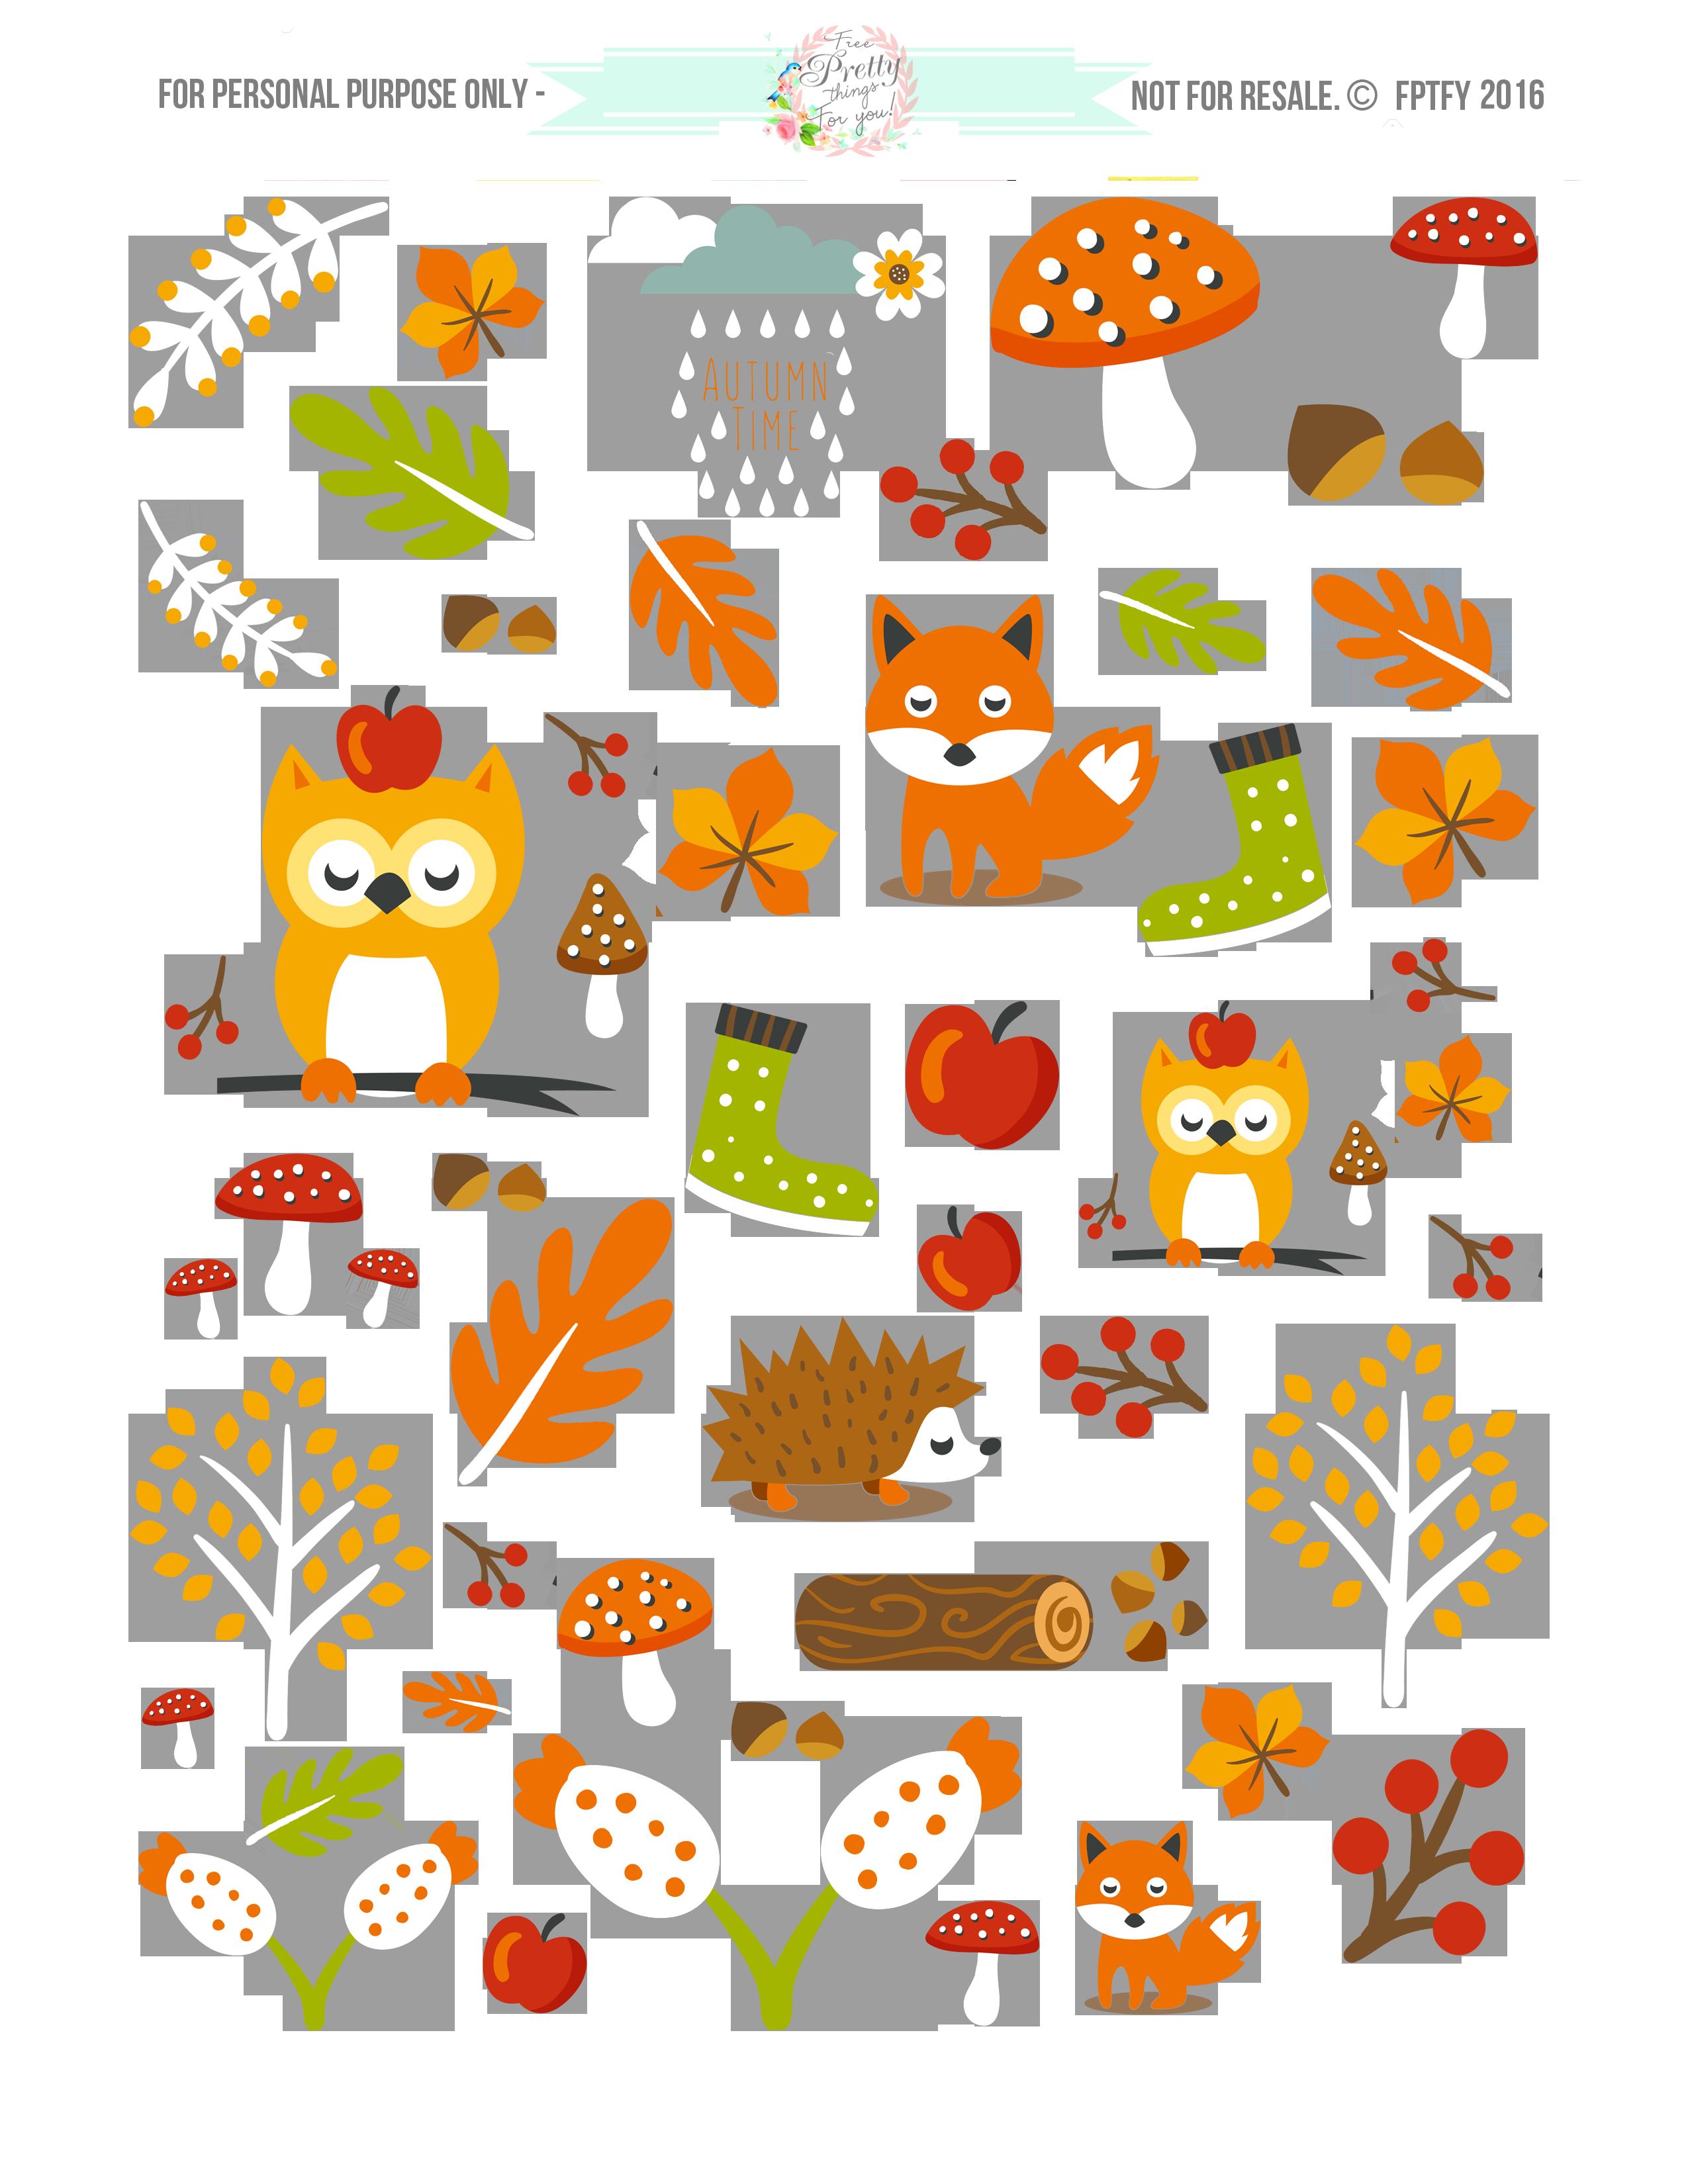 AutumnAnimalsPlannerStickers1.png (2550×3300) PNG